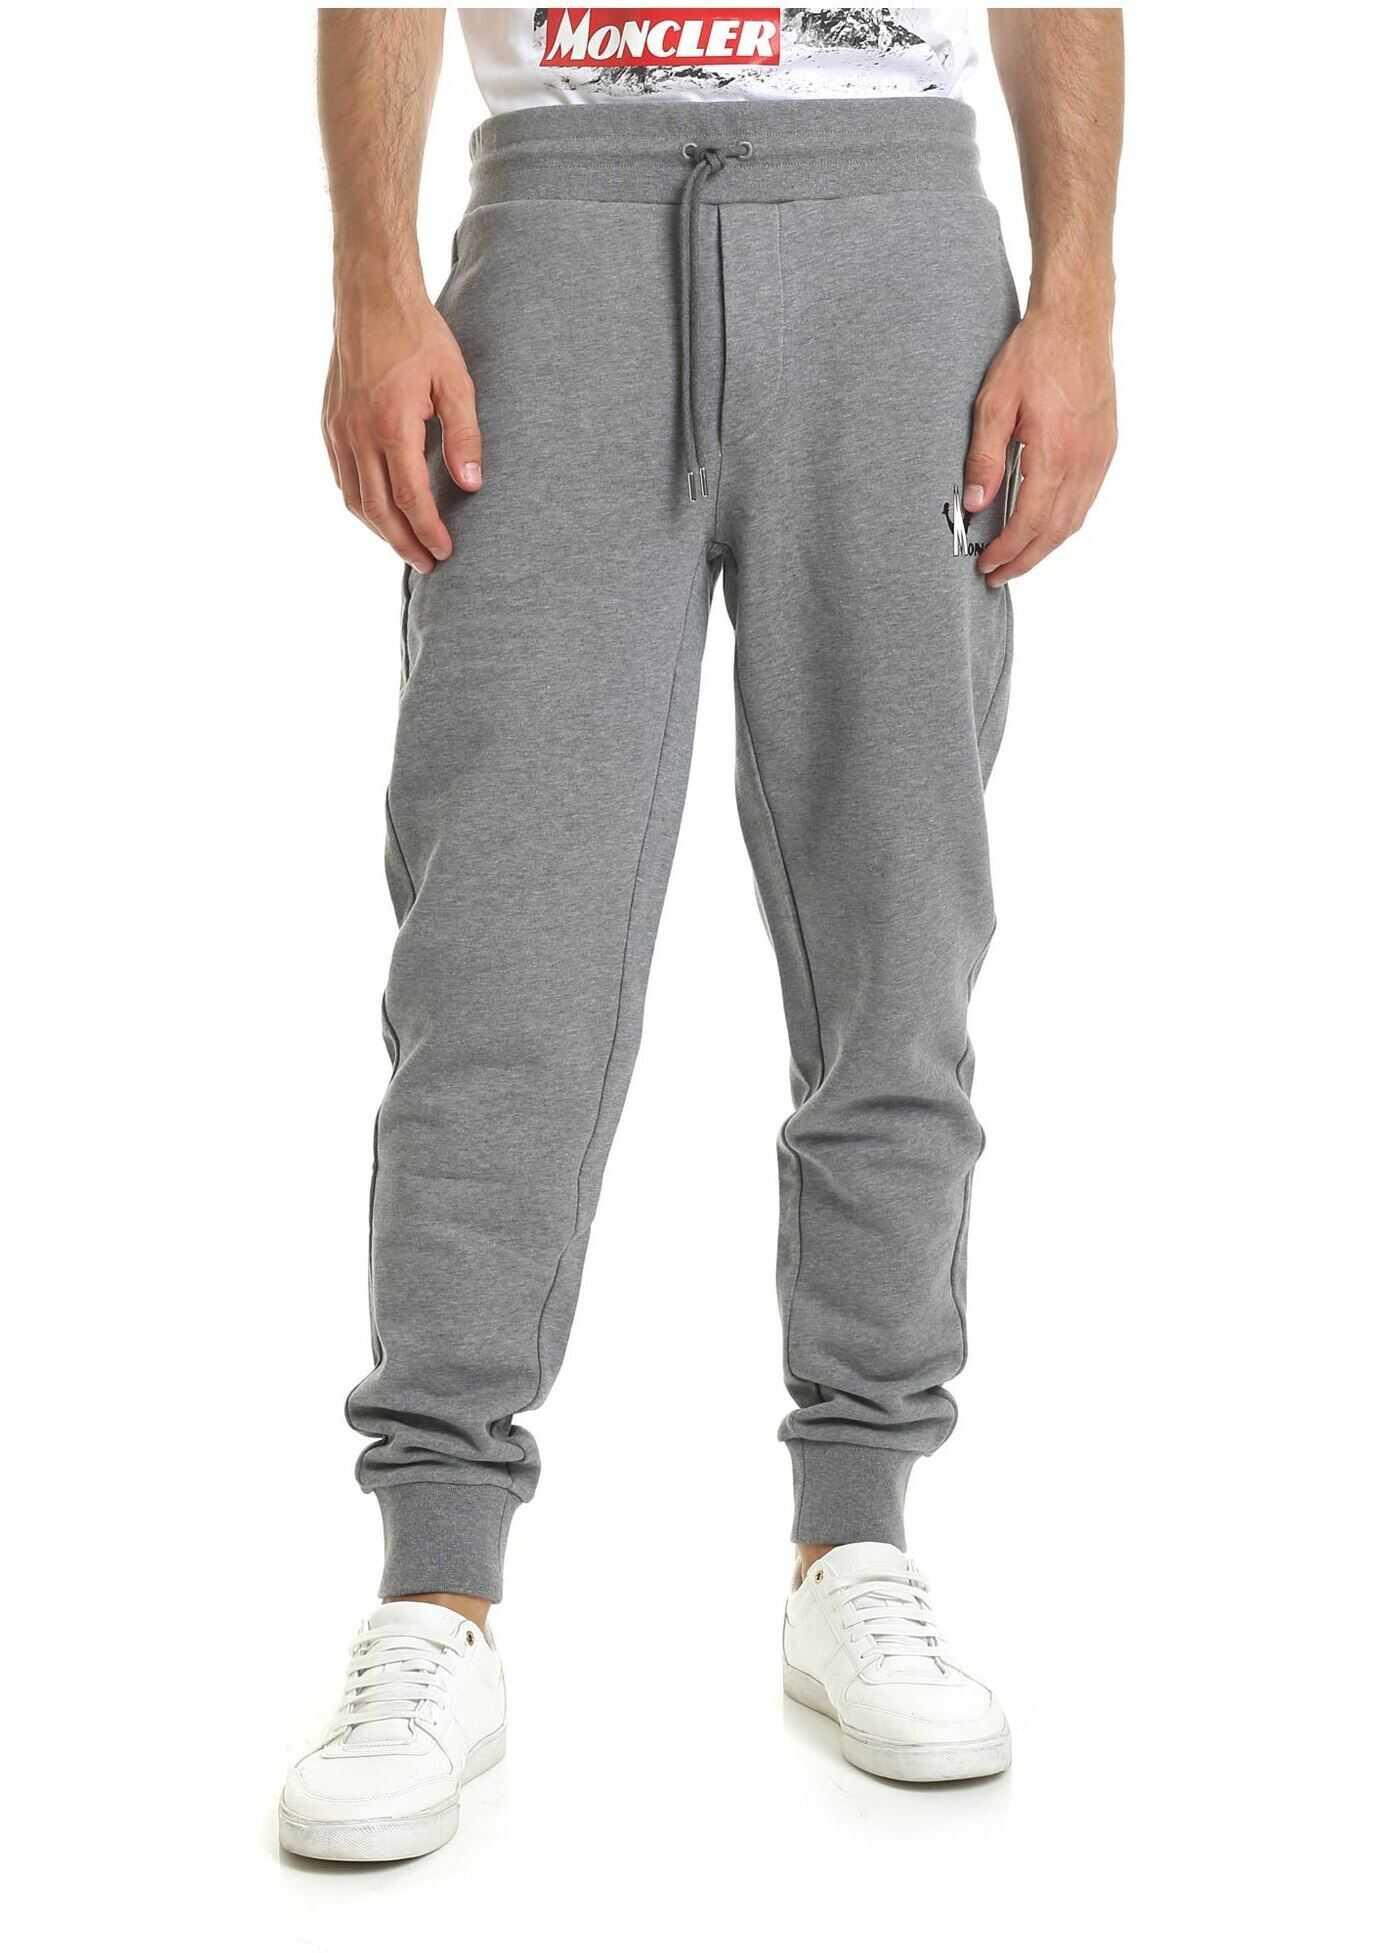 Moncler Moncler Printed Sweatpants In Grey Grey imagine